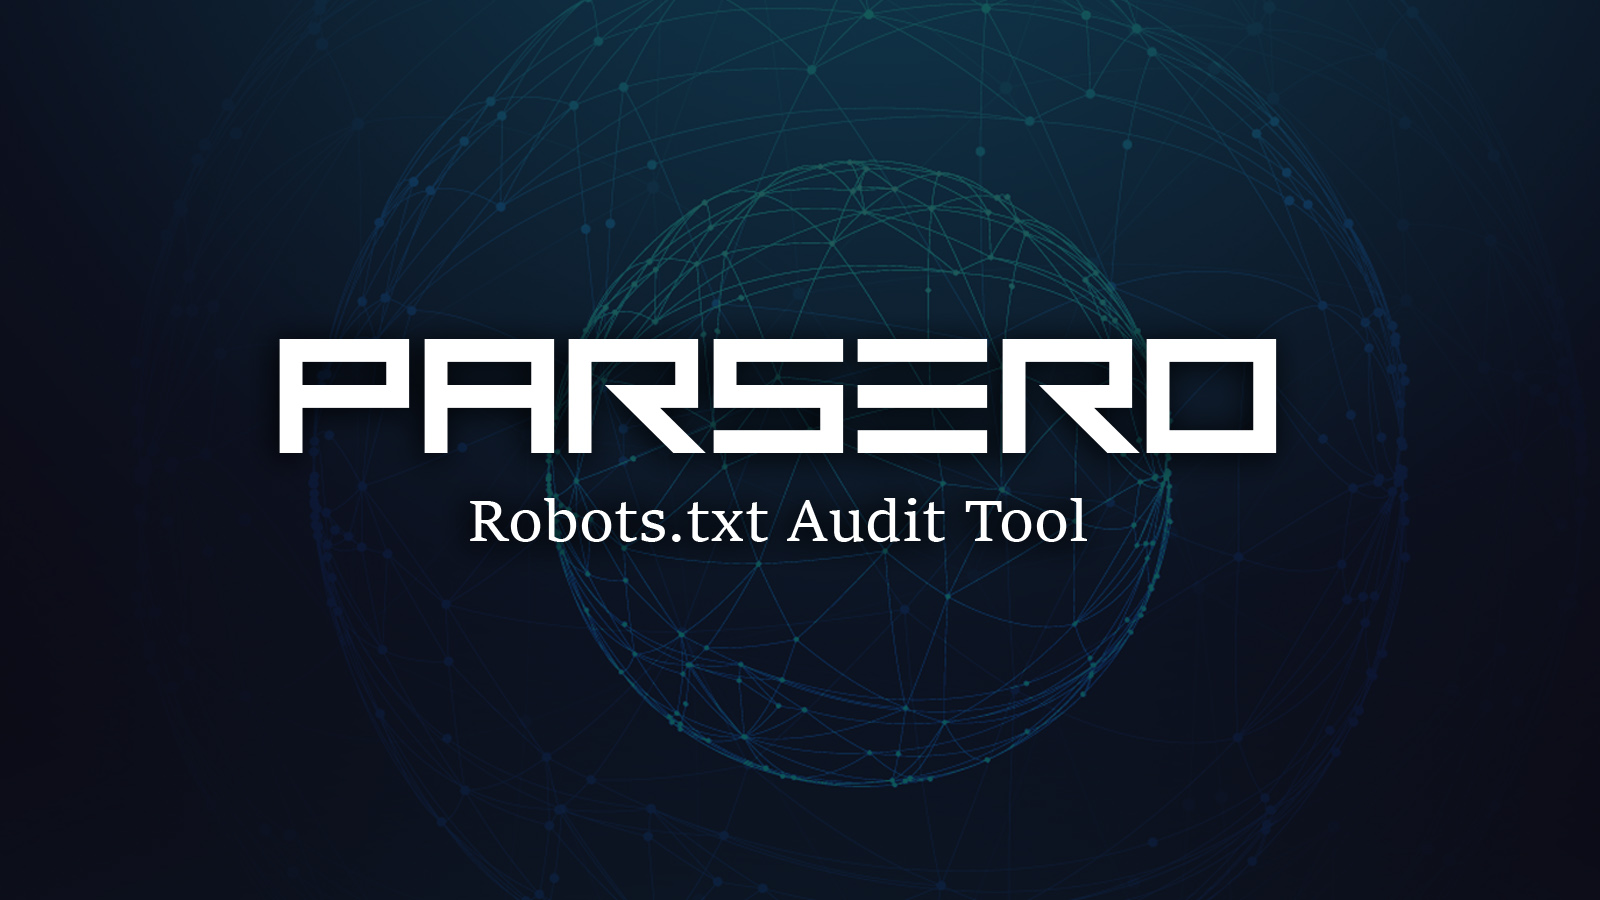 Parsero - Robots txt Audit Tool - Hacking Reviews